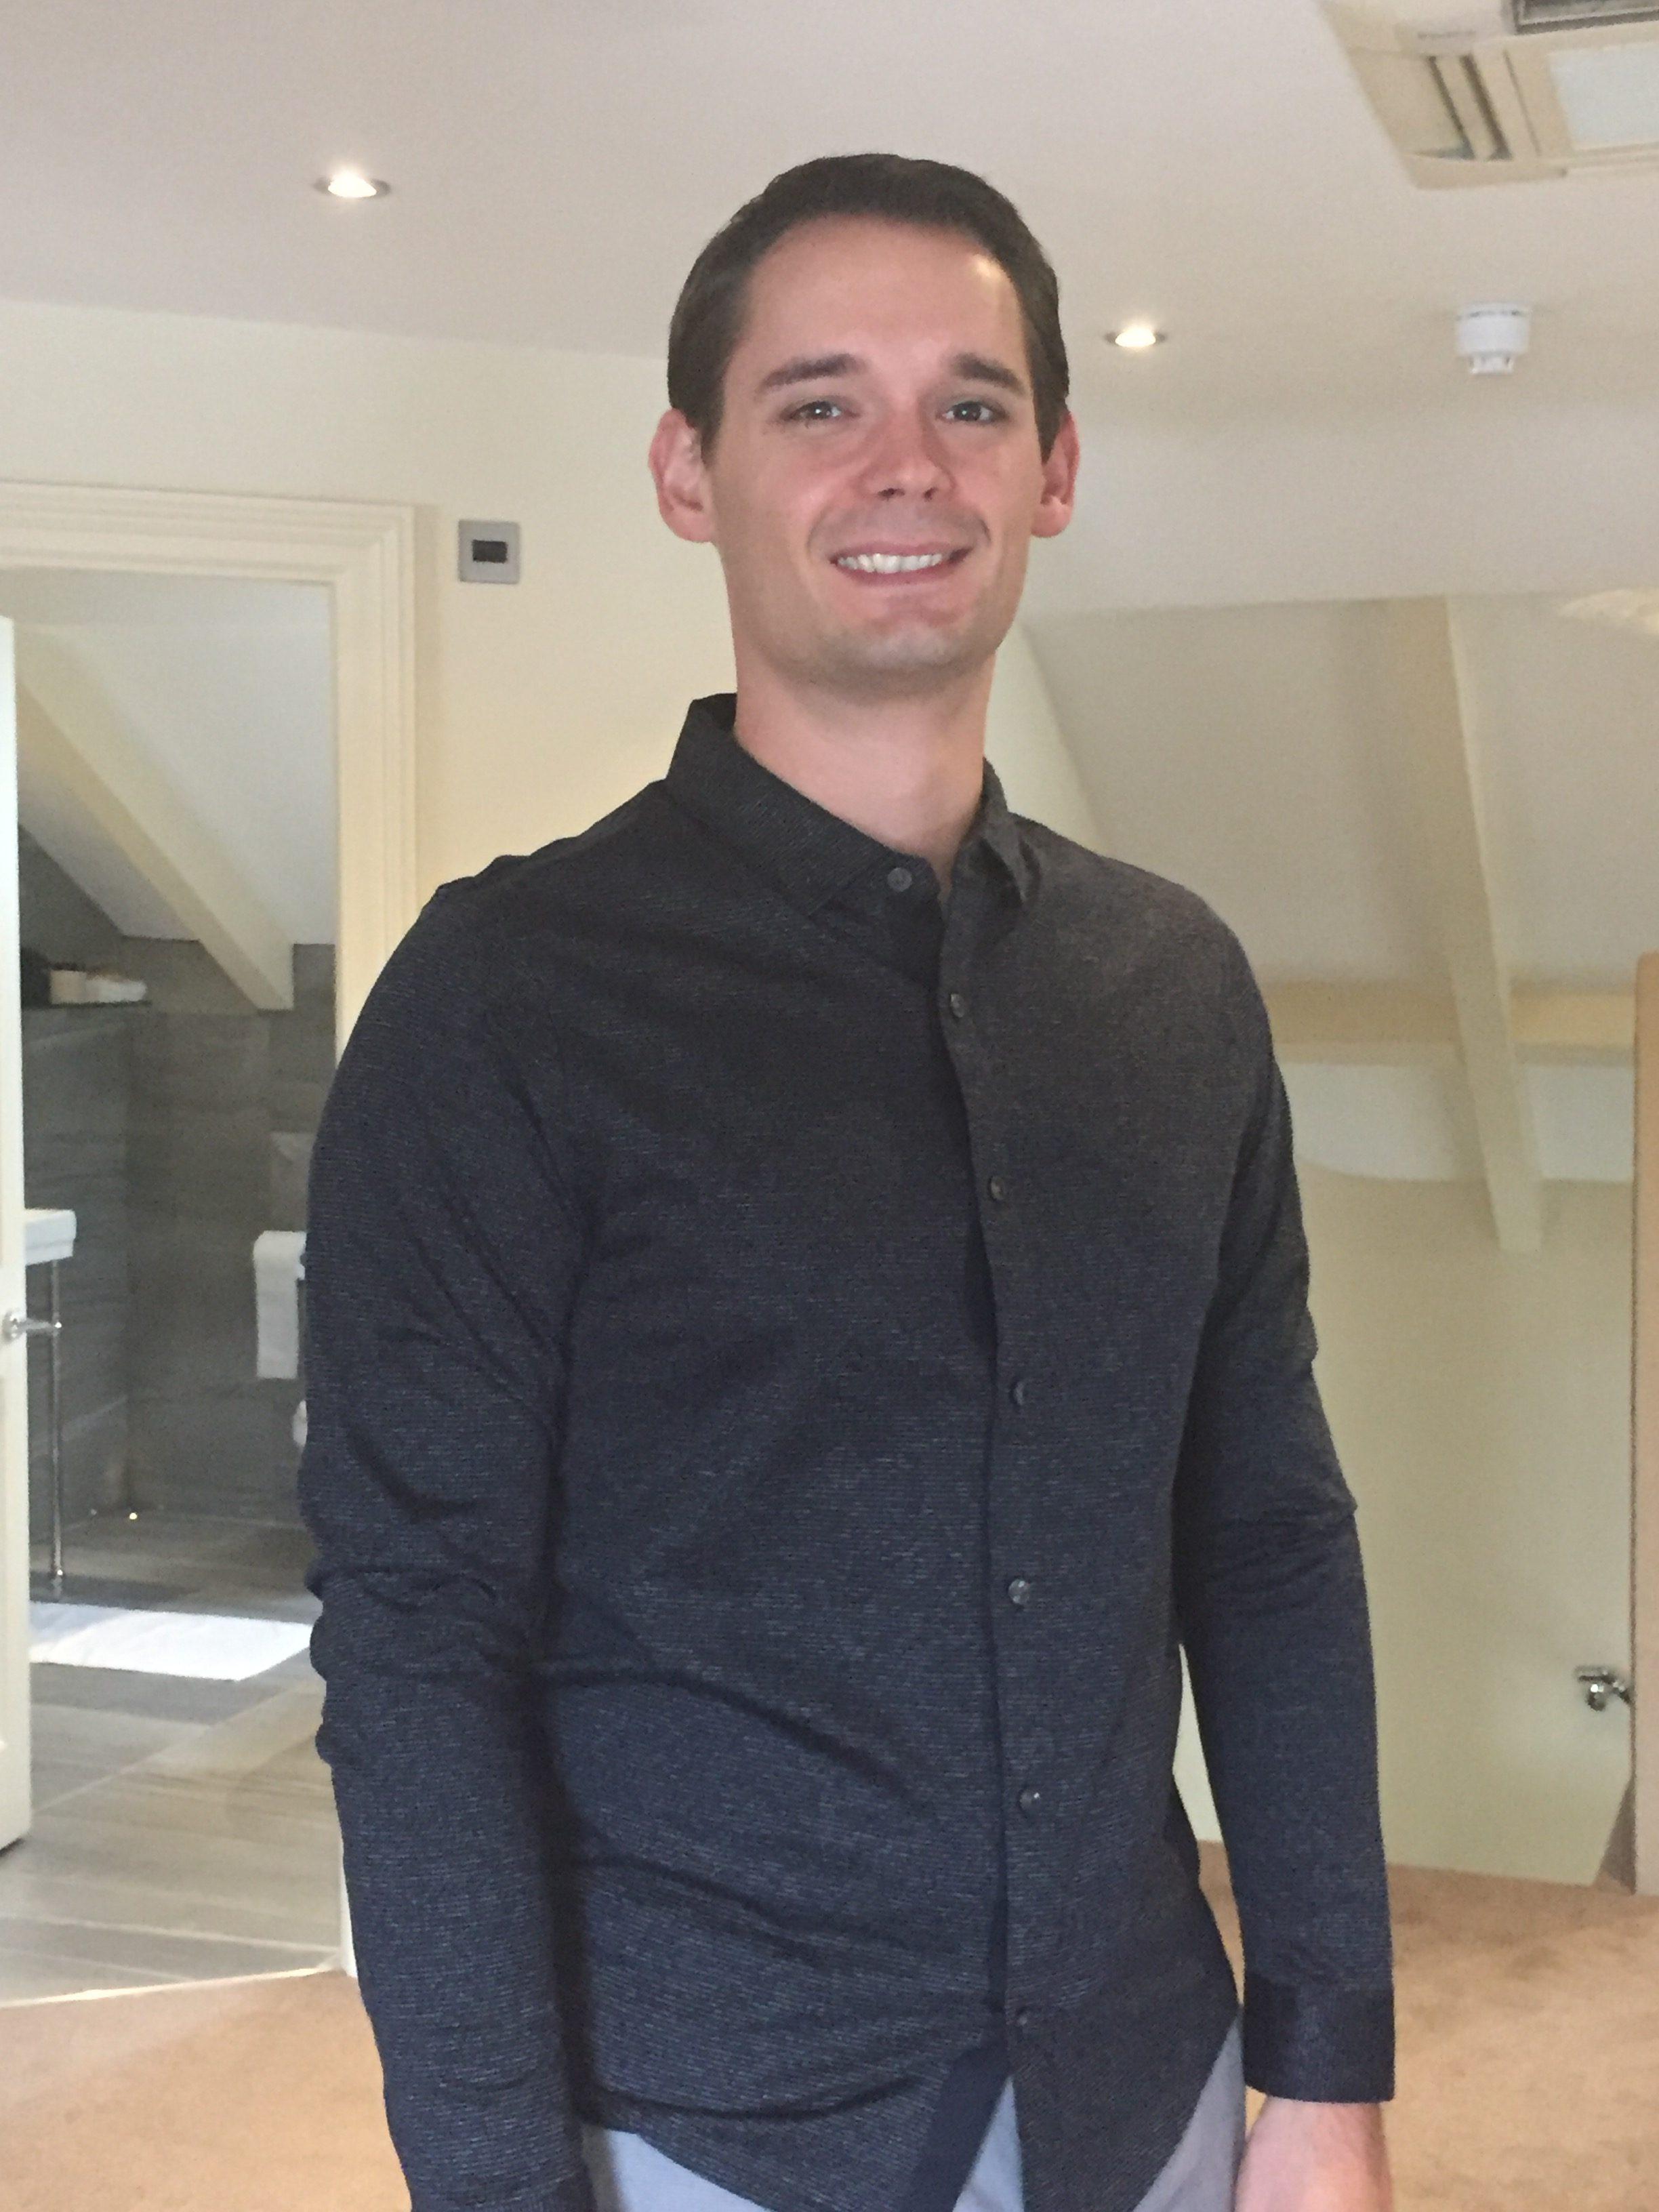 LiquidSonics founder Matt Hill